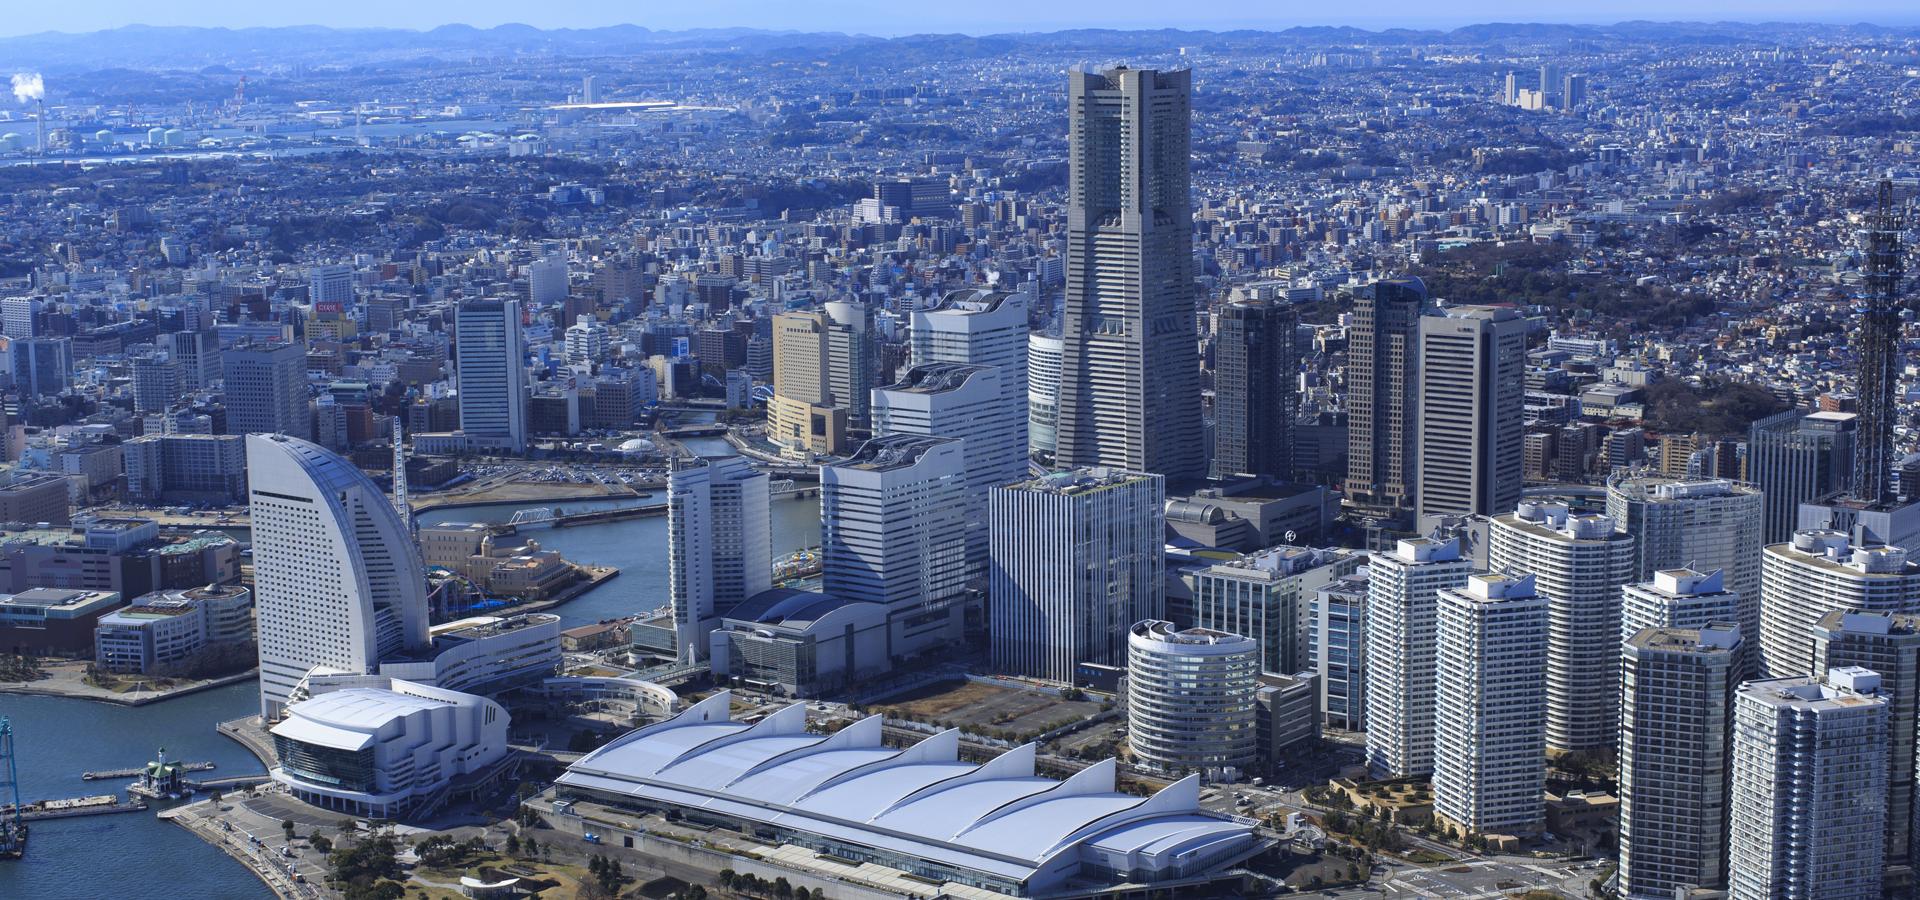 Peer-to-peer advisory in Yokohama, Kanagawa, Japan